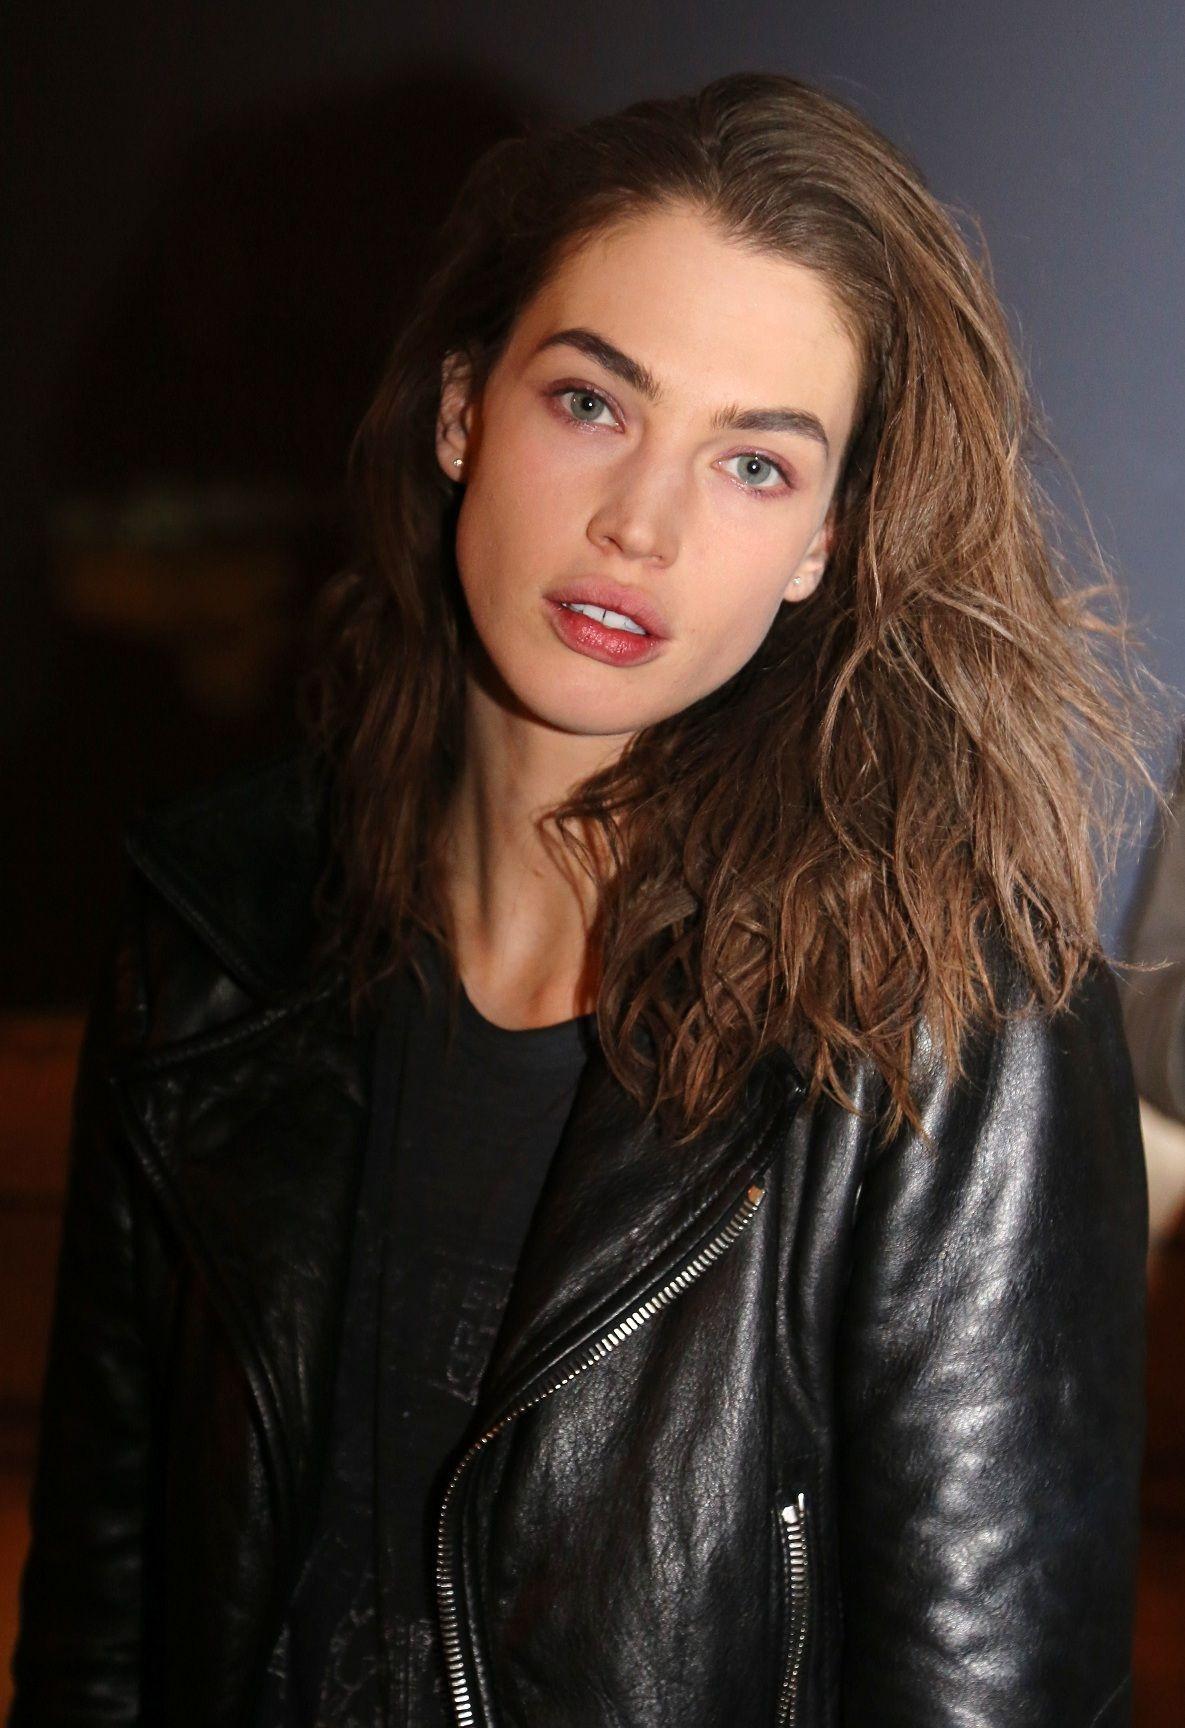 crista cober salsitcrush modelcrush women looks pinterest